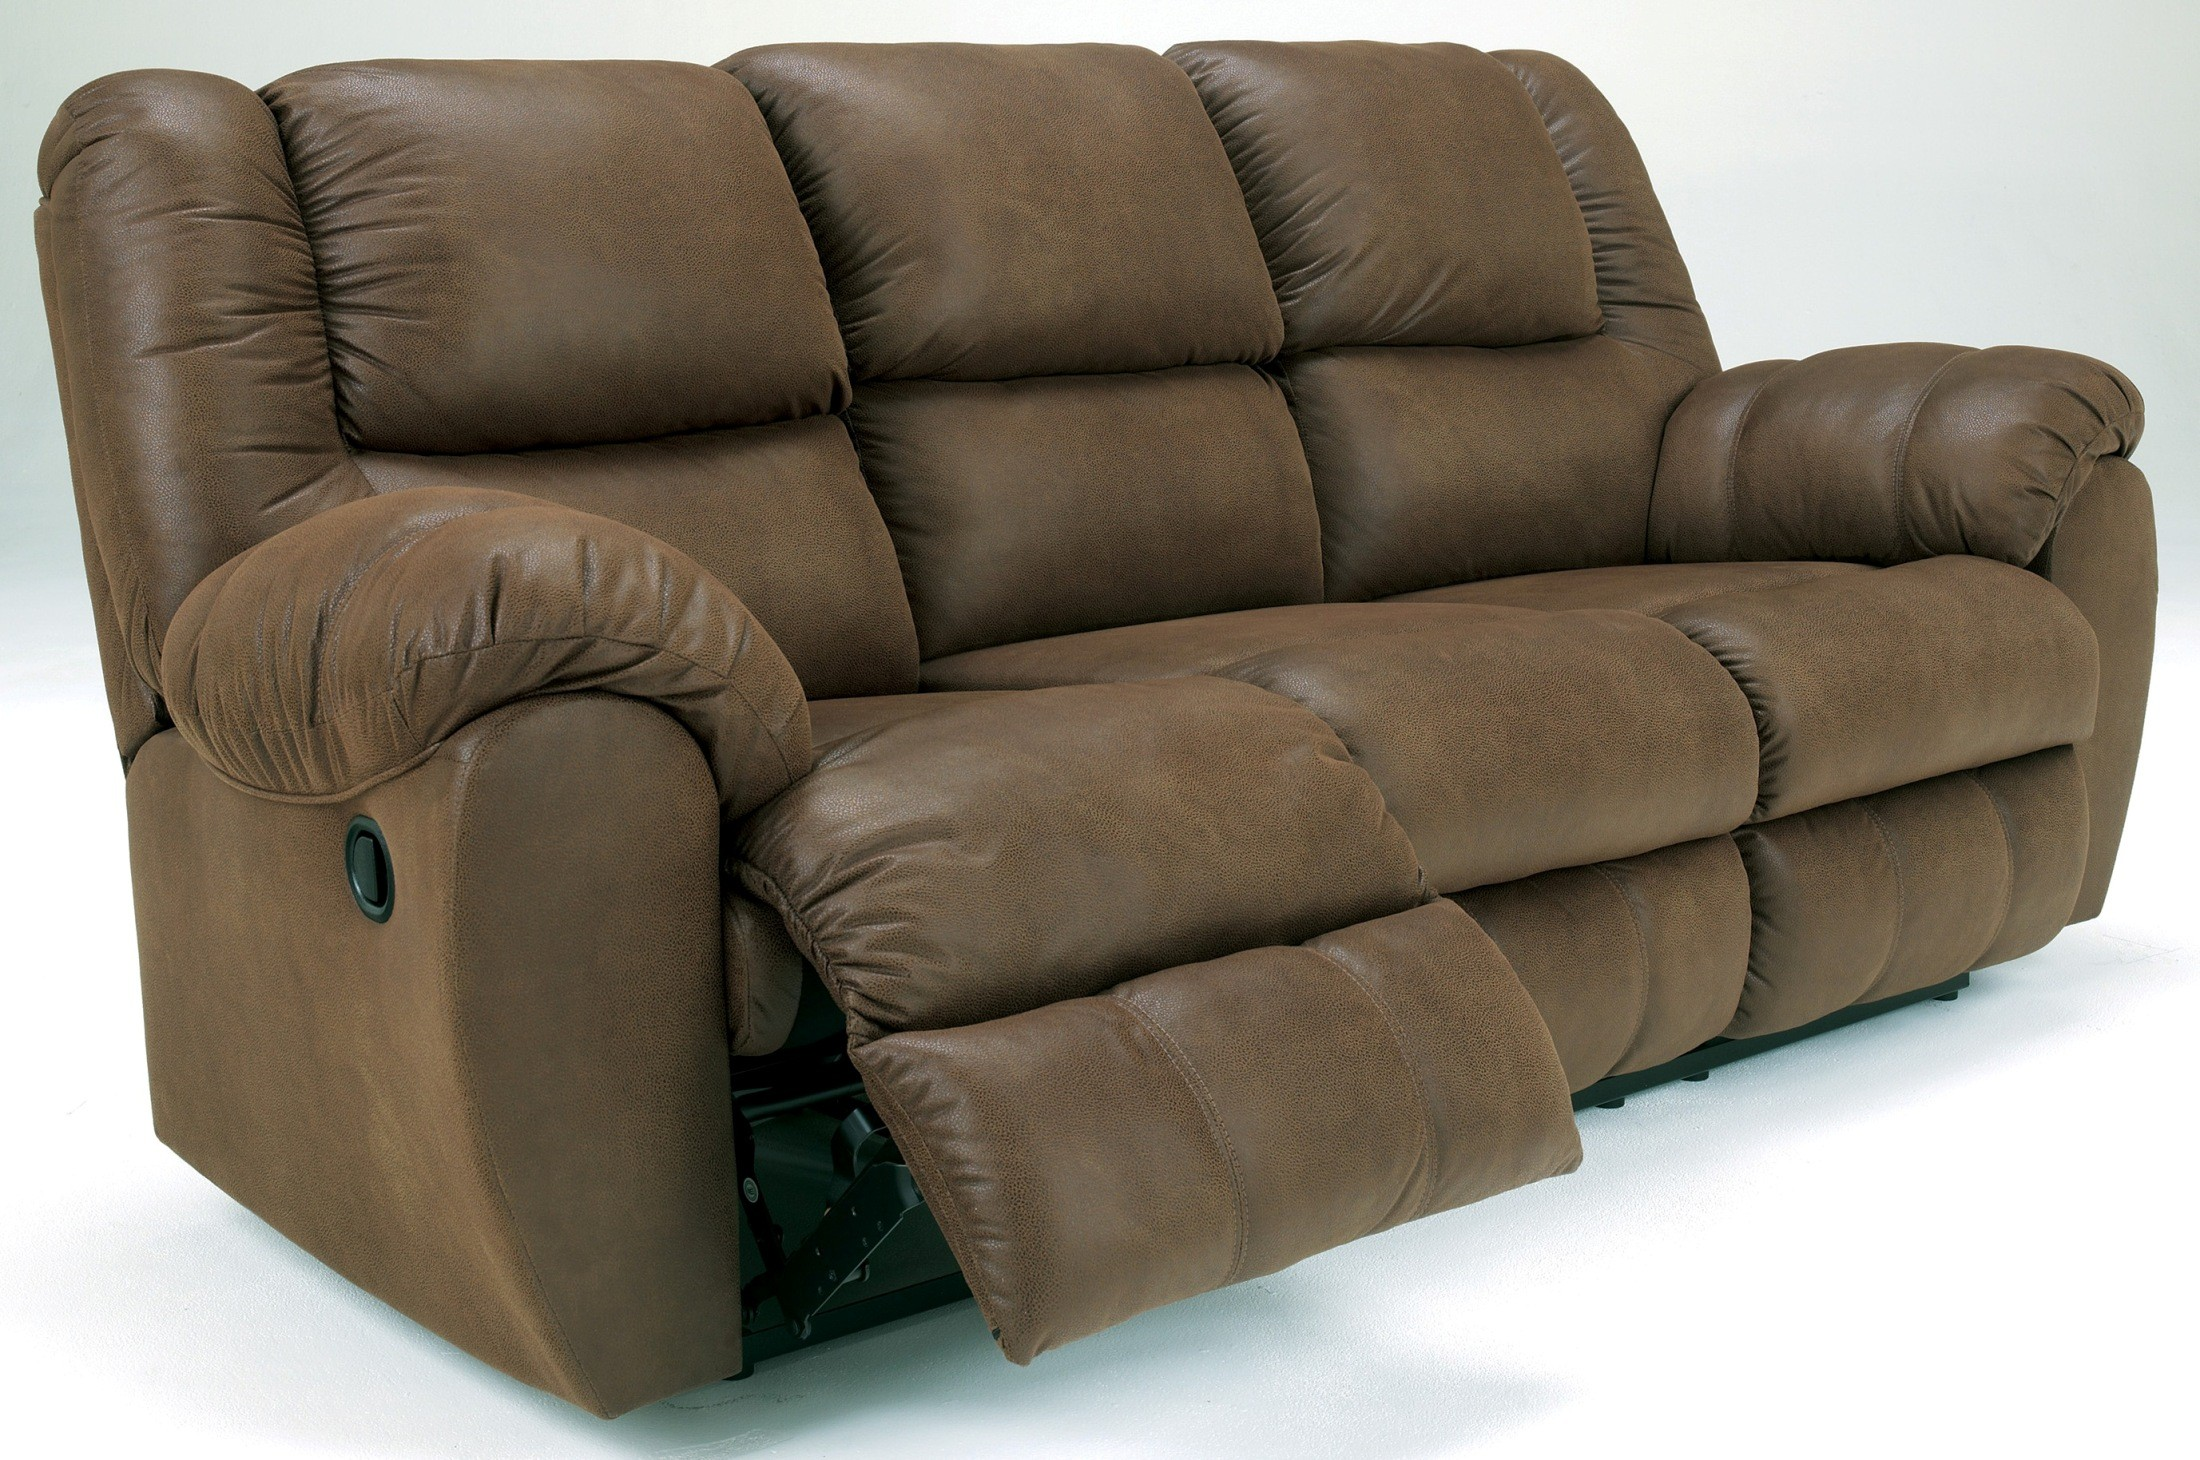 Quarterback Canyon Reclining Sofa From Ashley 3270188